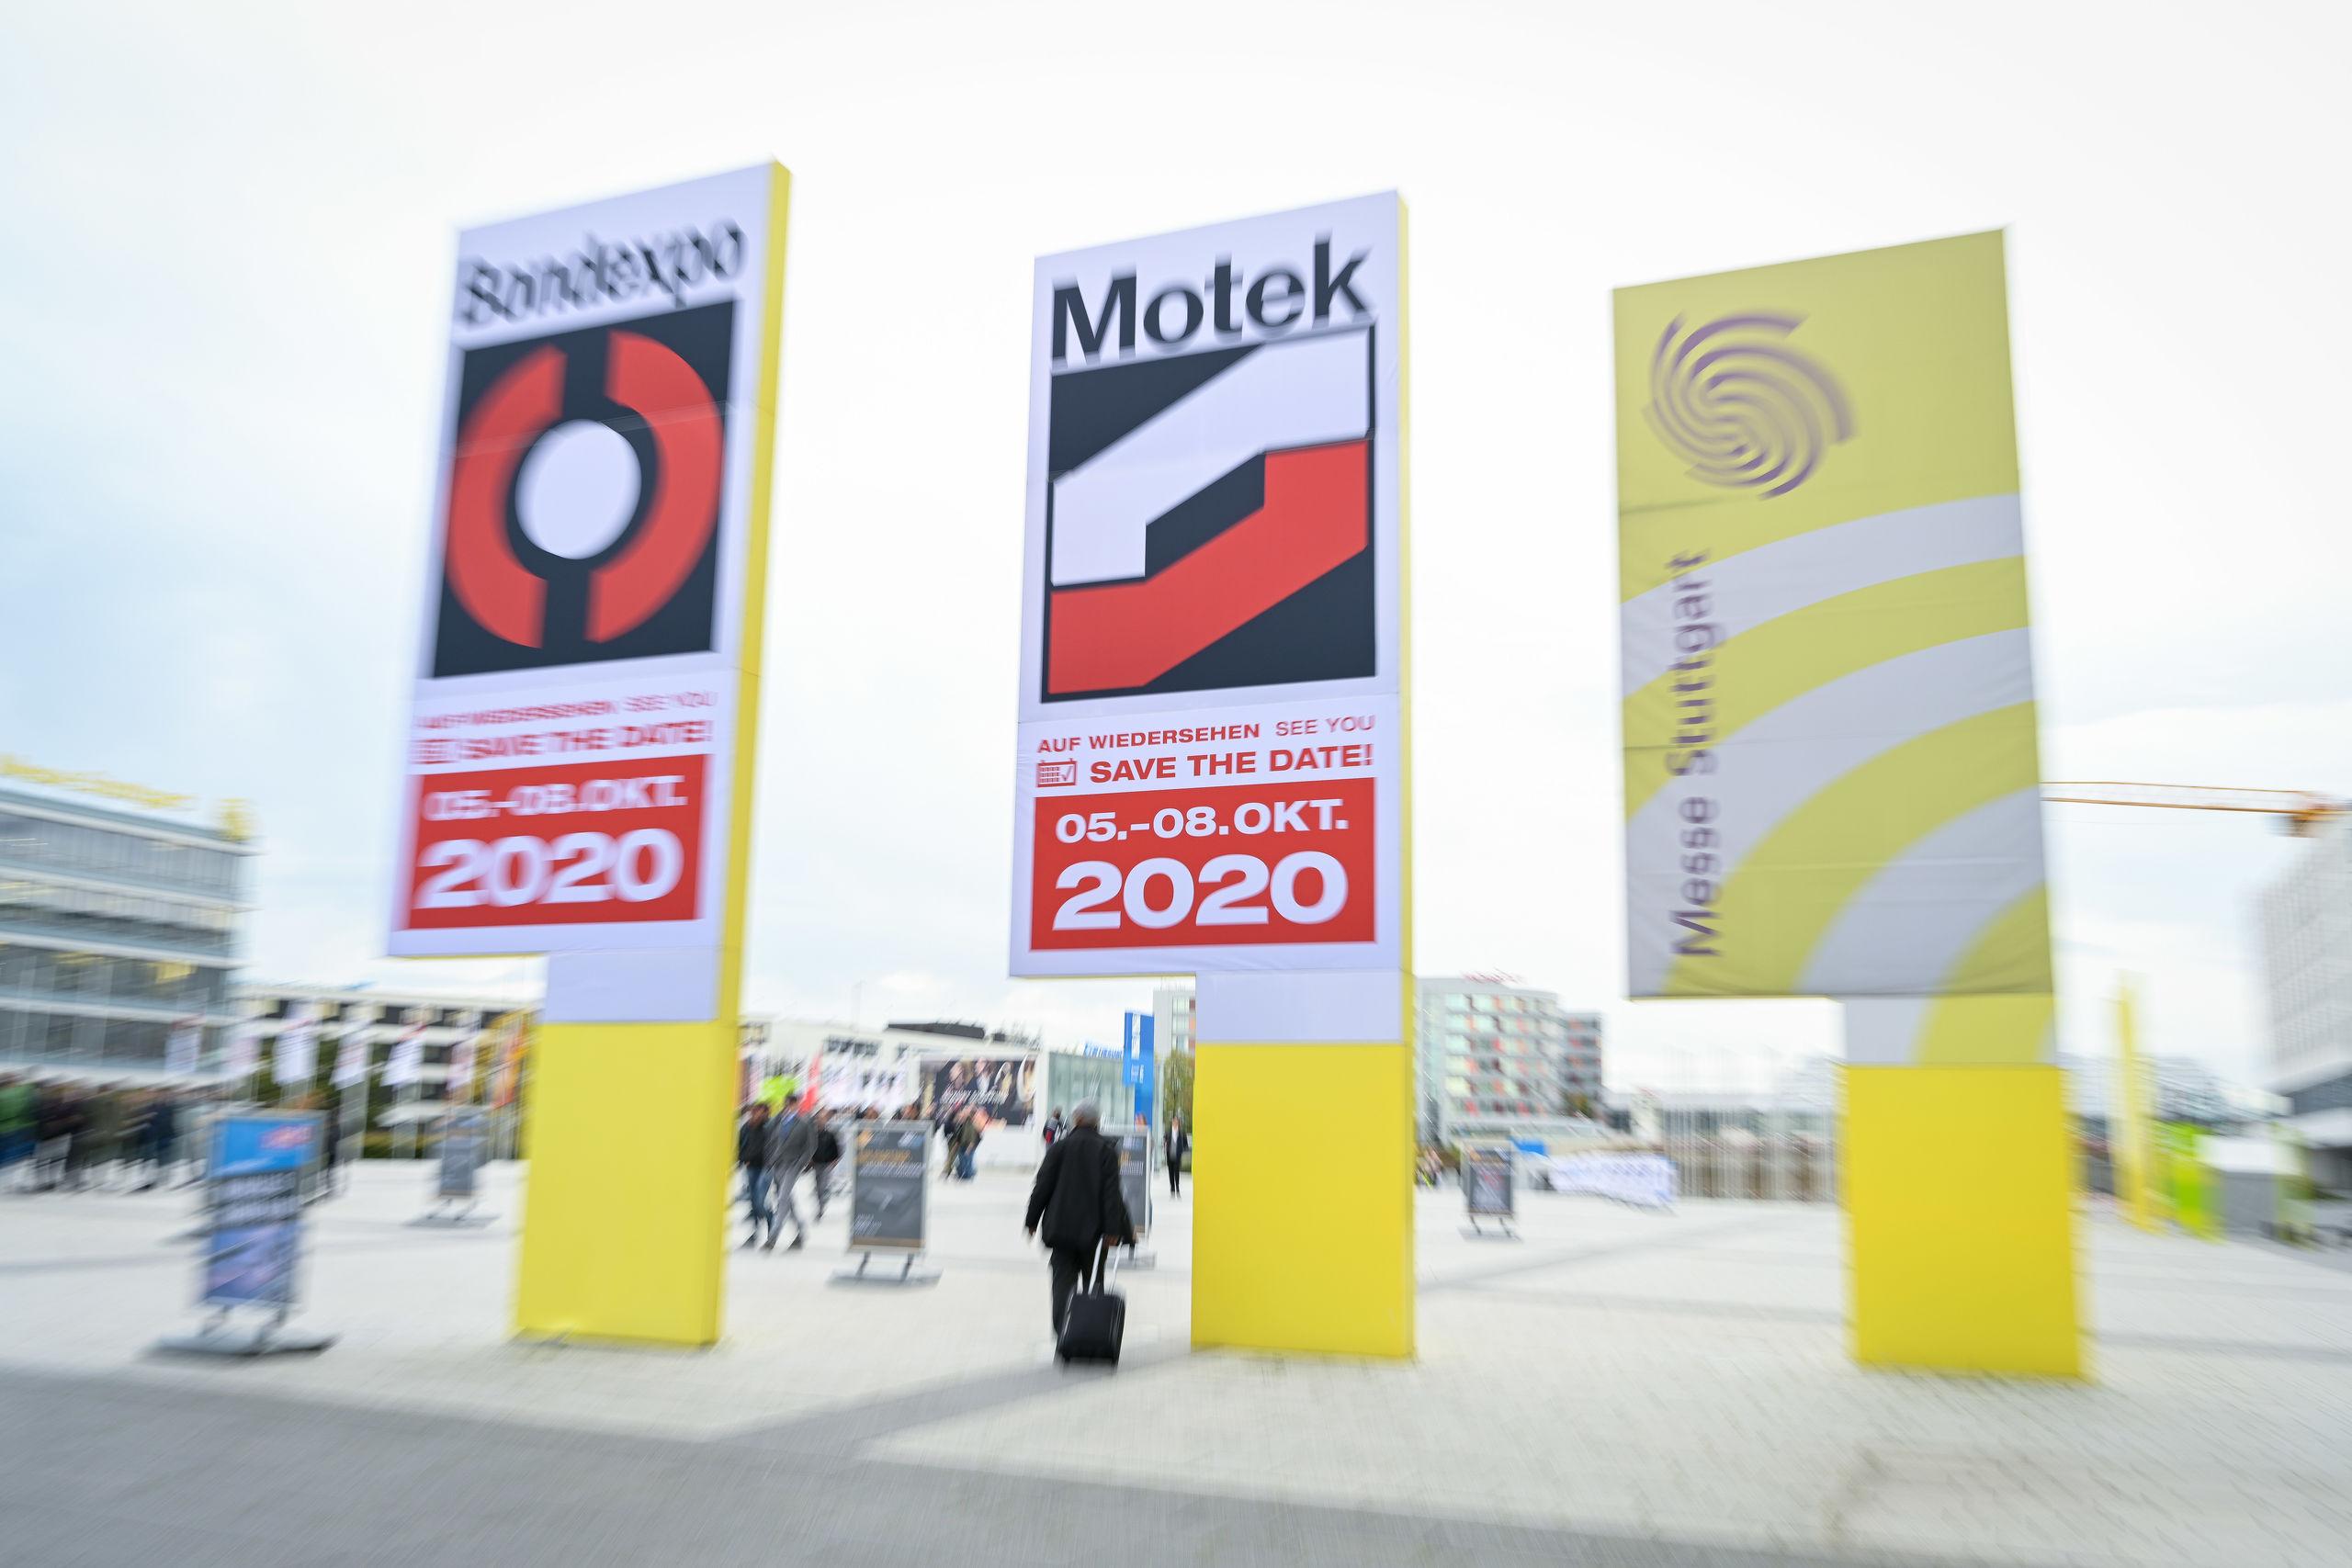 Foto: Motek / P. E. Schall GmbH & Co. KG